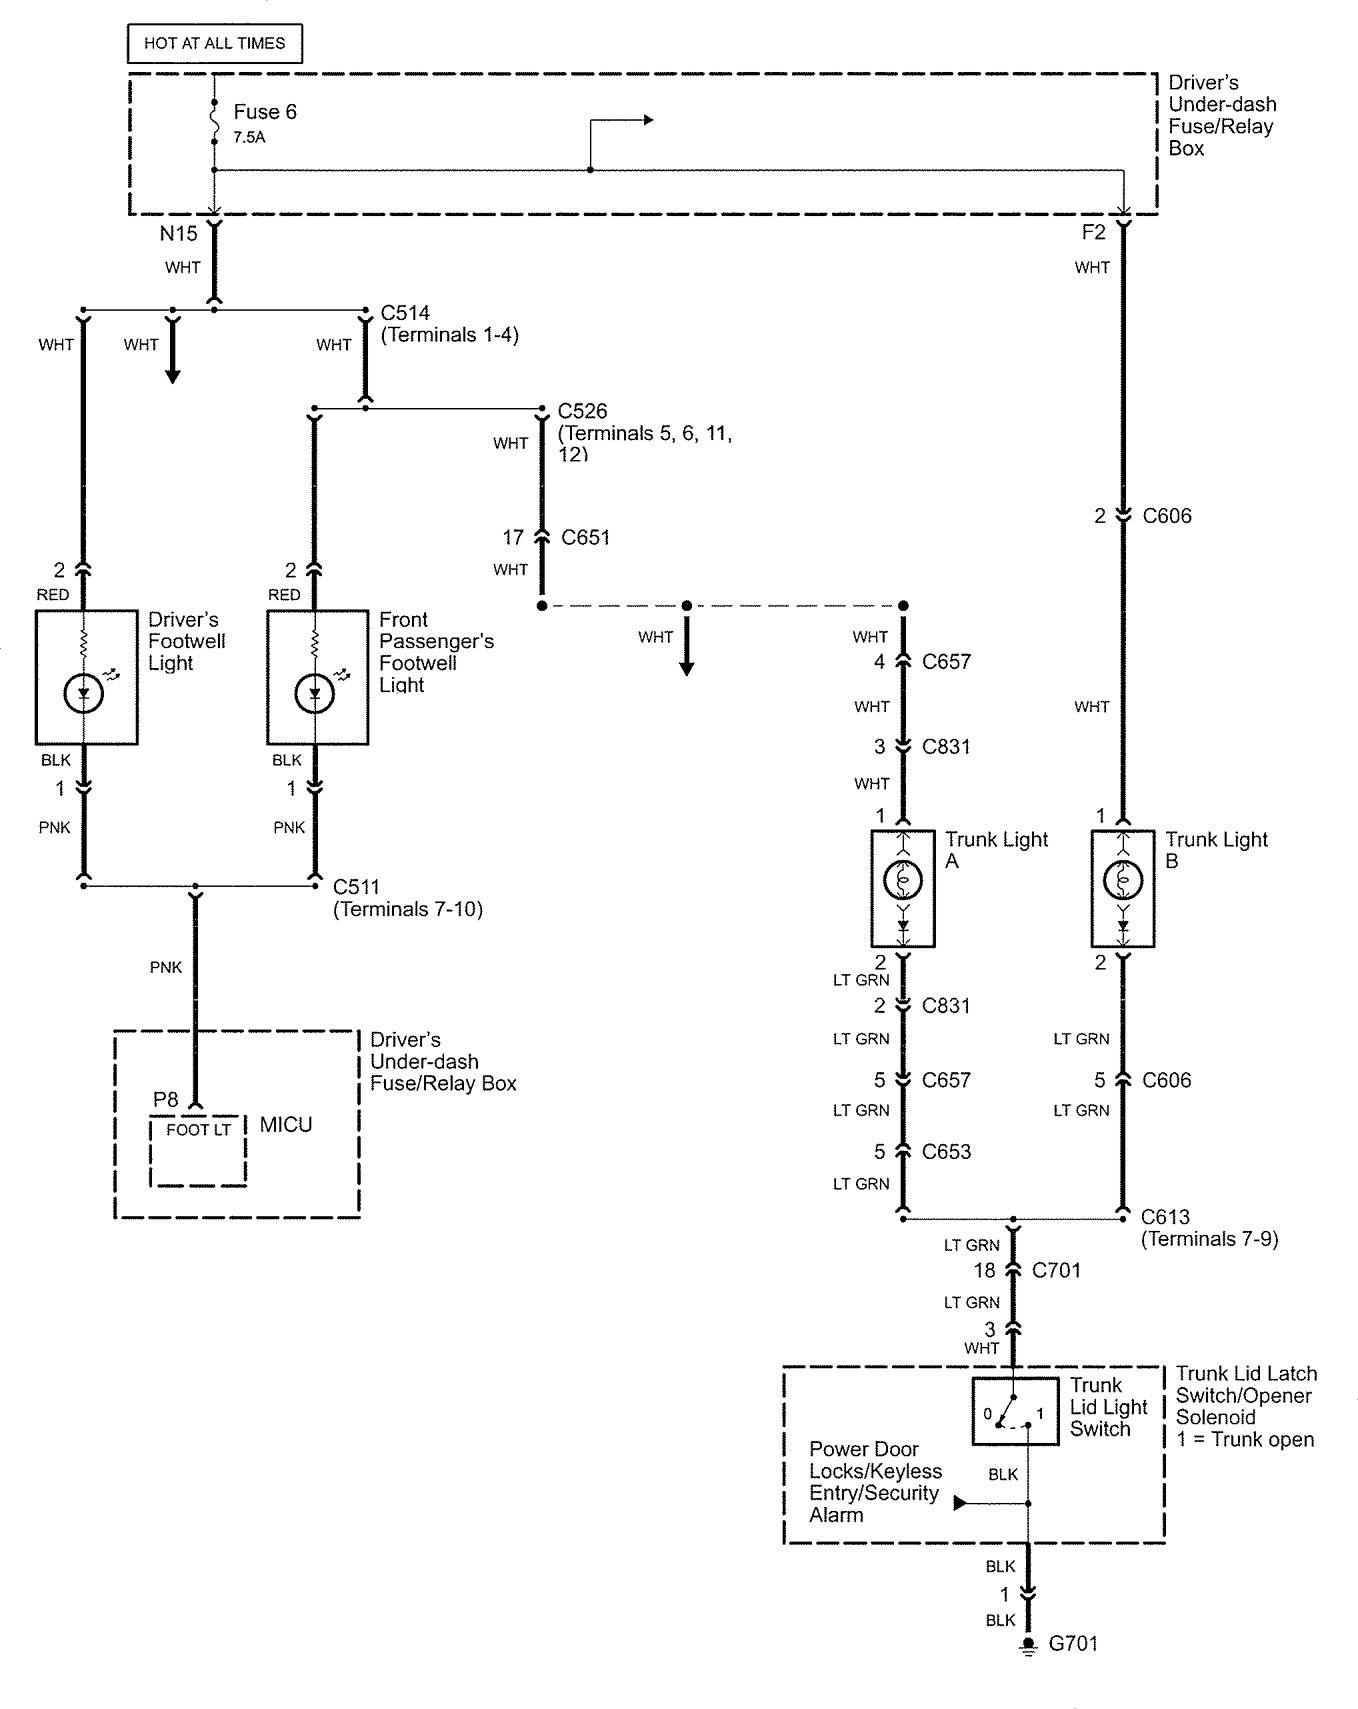 Western Star Transmission Wiring Diagram 2011 Will Acura Rl 2005 Diagrams Interior Lighting Schematics